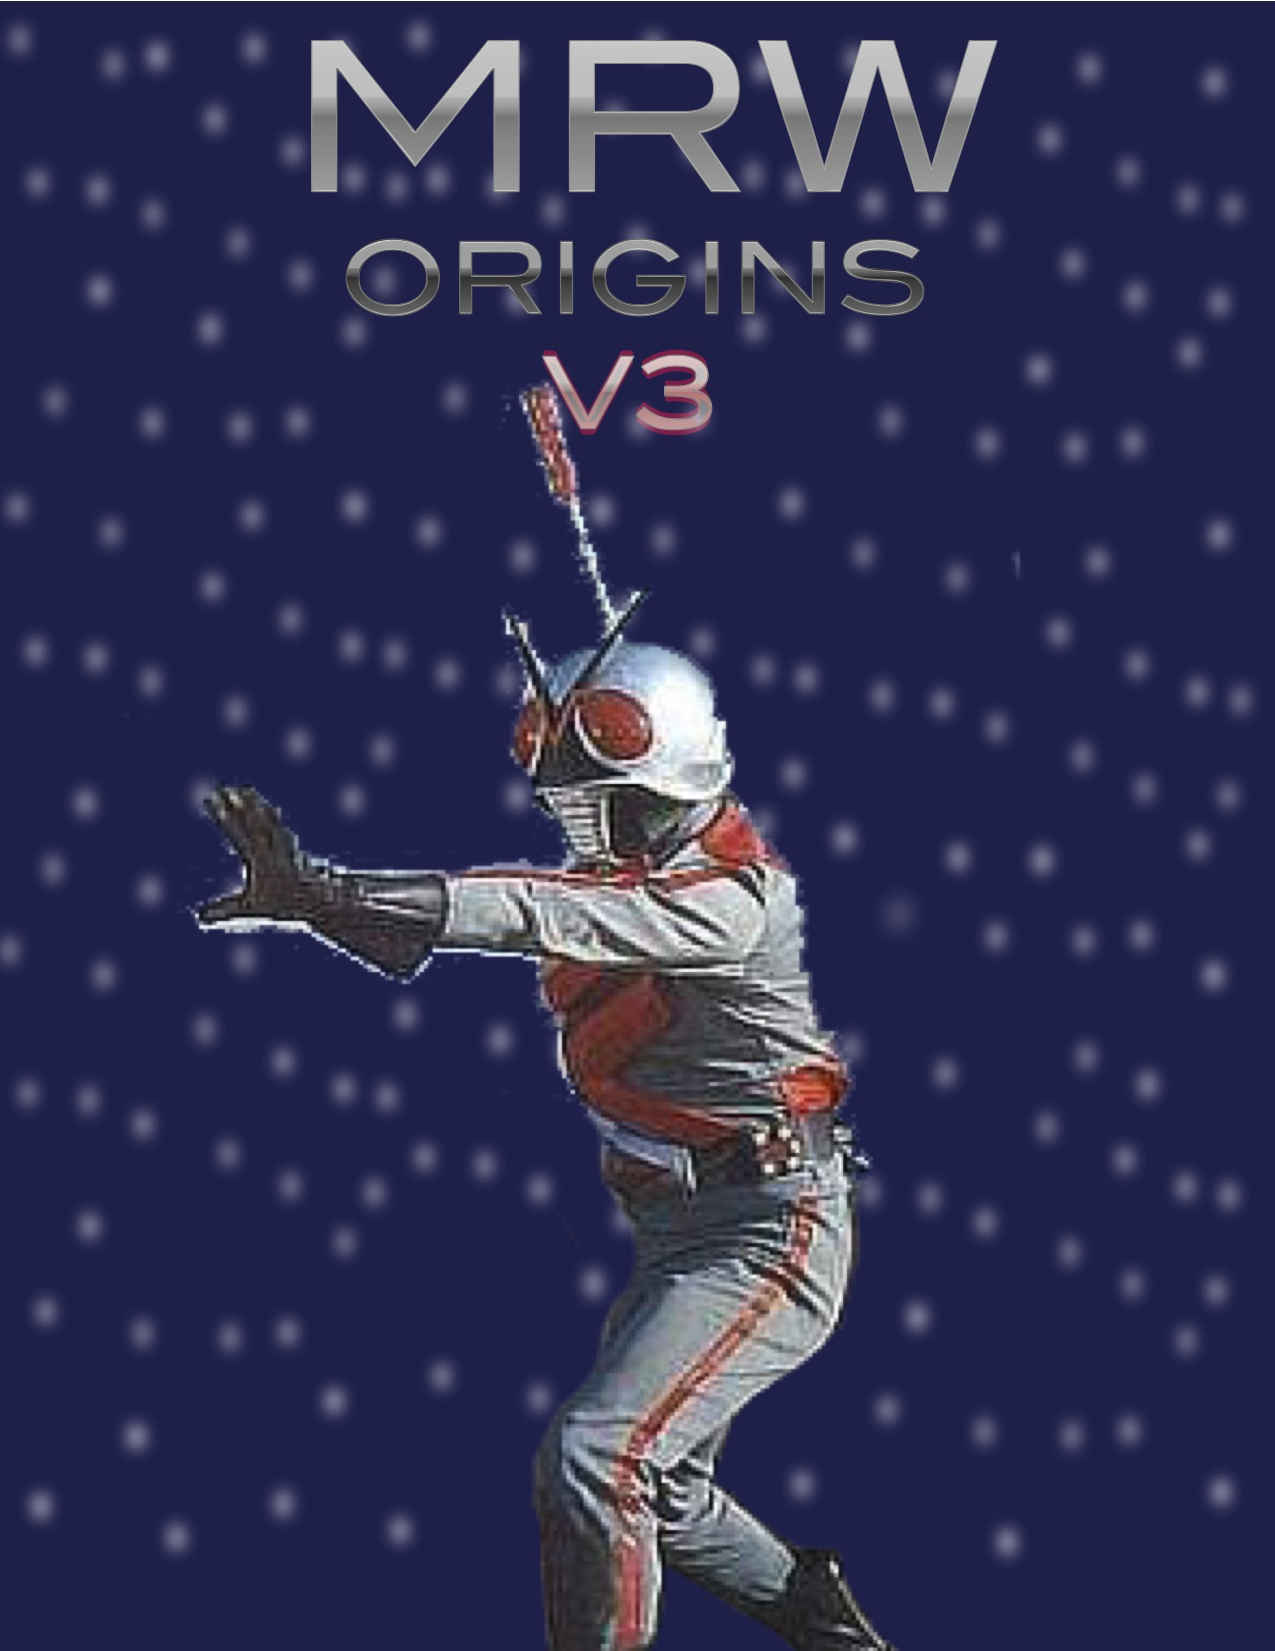 MRW Origins: V3